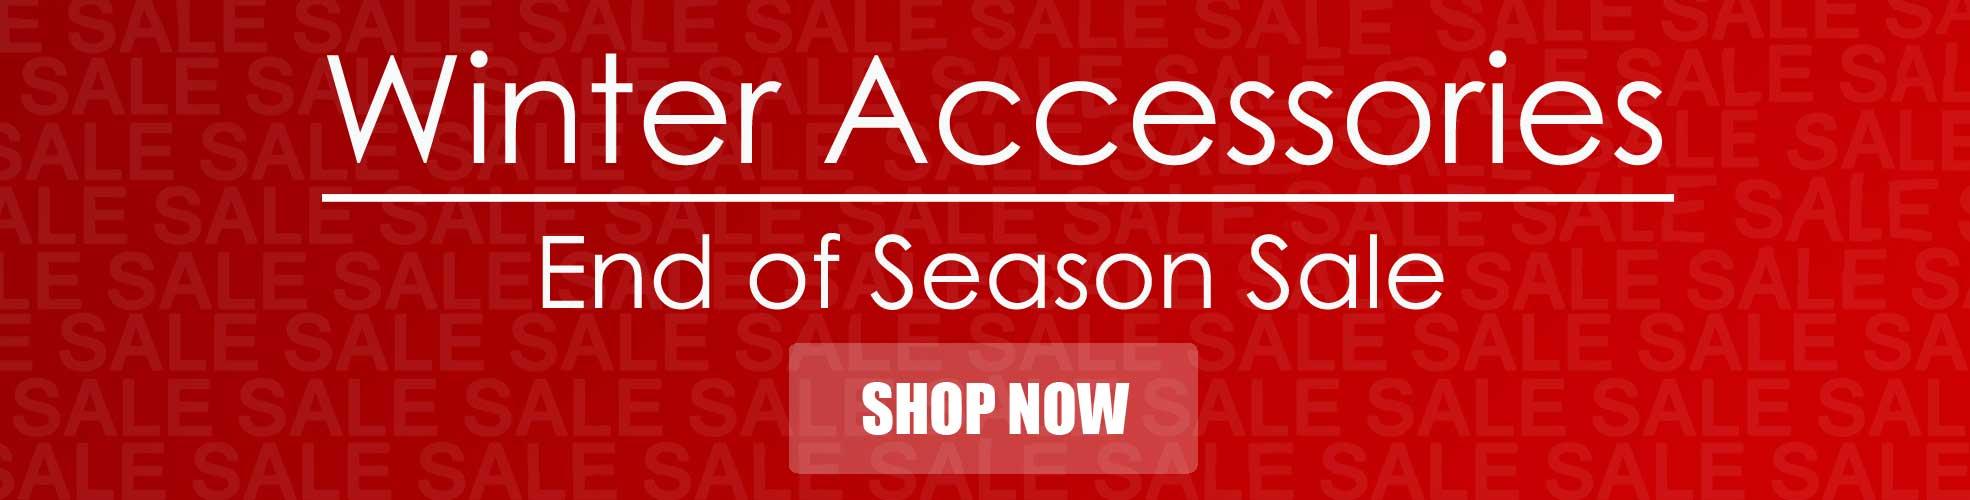 Winter Accessories Sales, Gloves, Hats, Socks